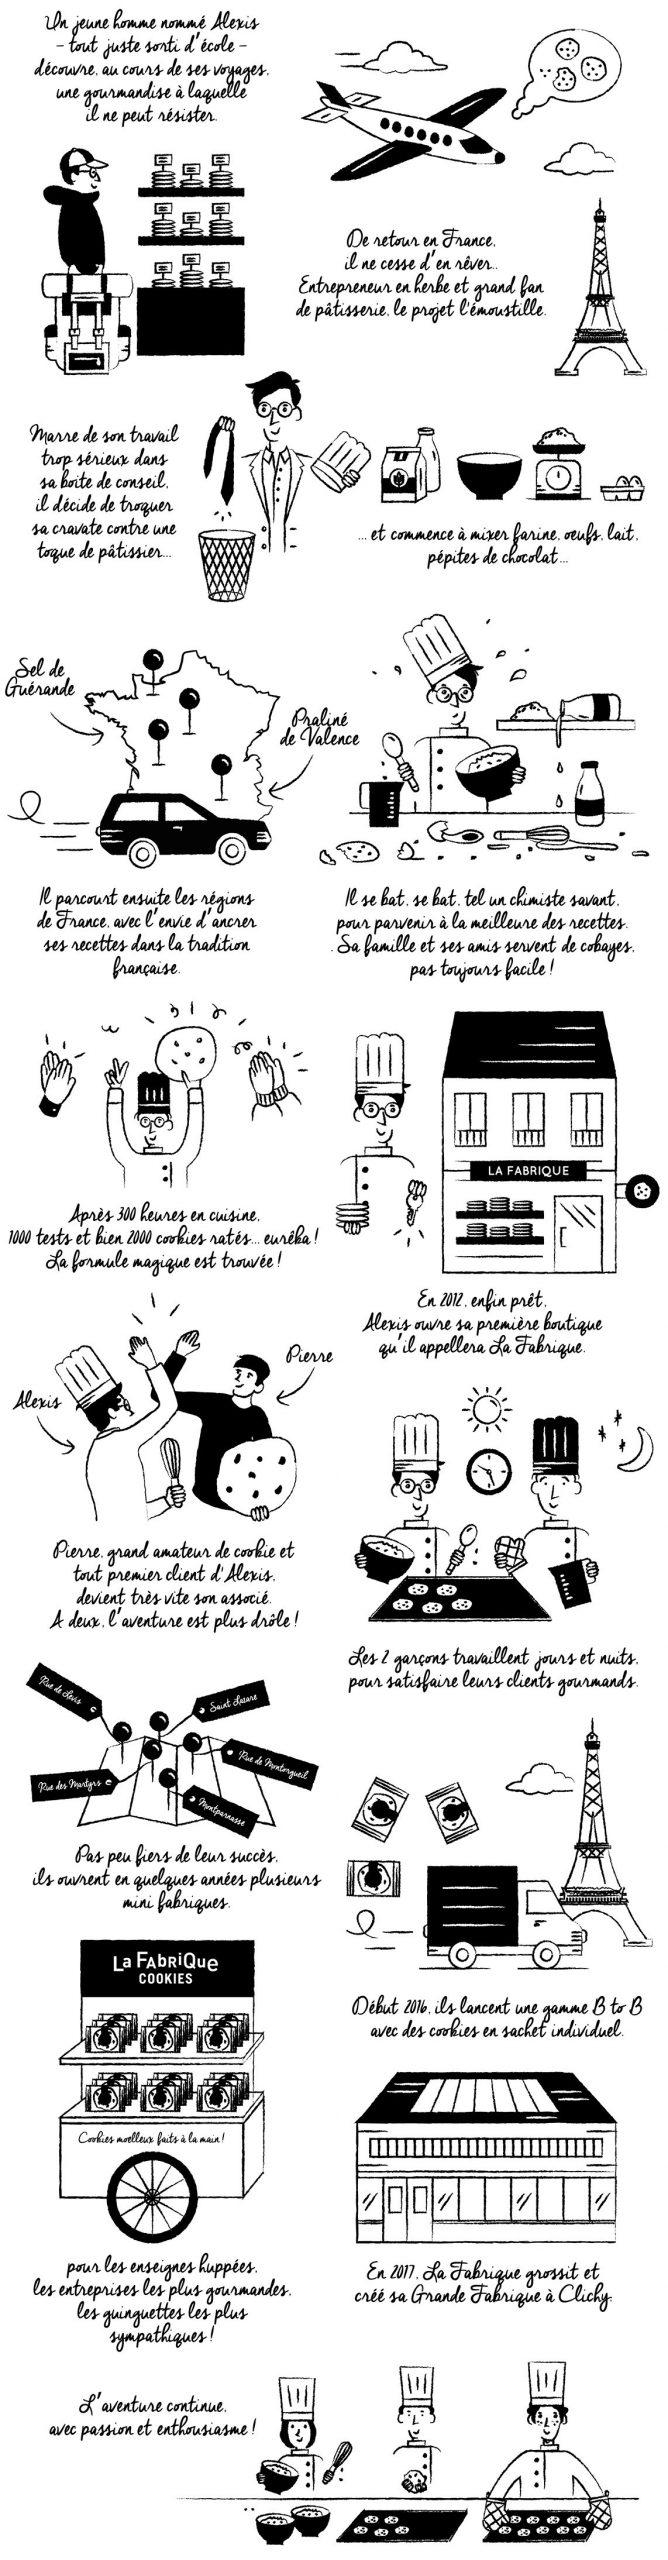 STORYTELLING fabrique cookies scaled - L'annuaire des jeunes marques alimentaires vertueuses !